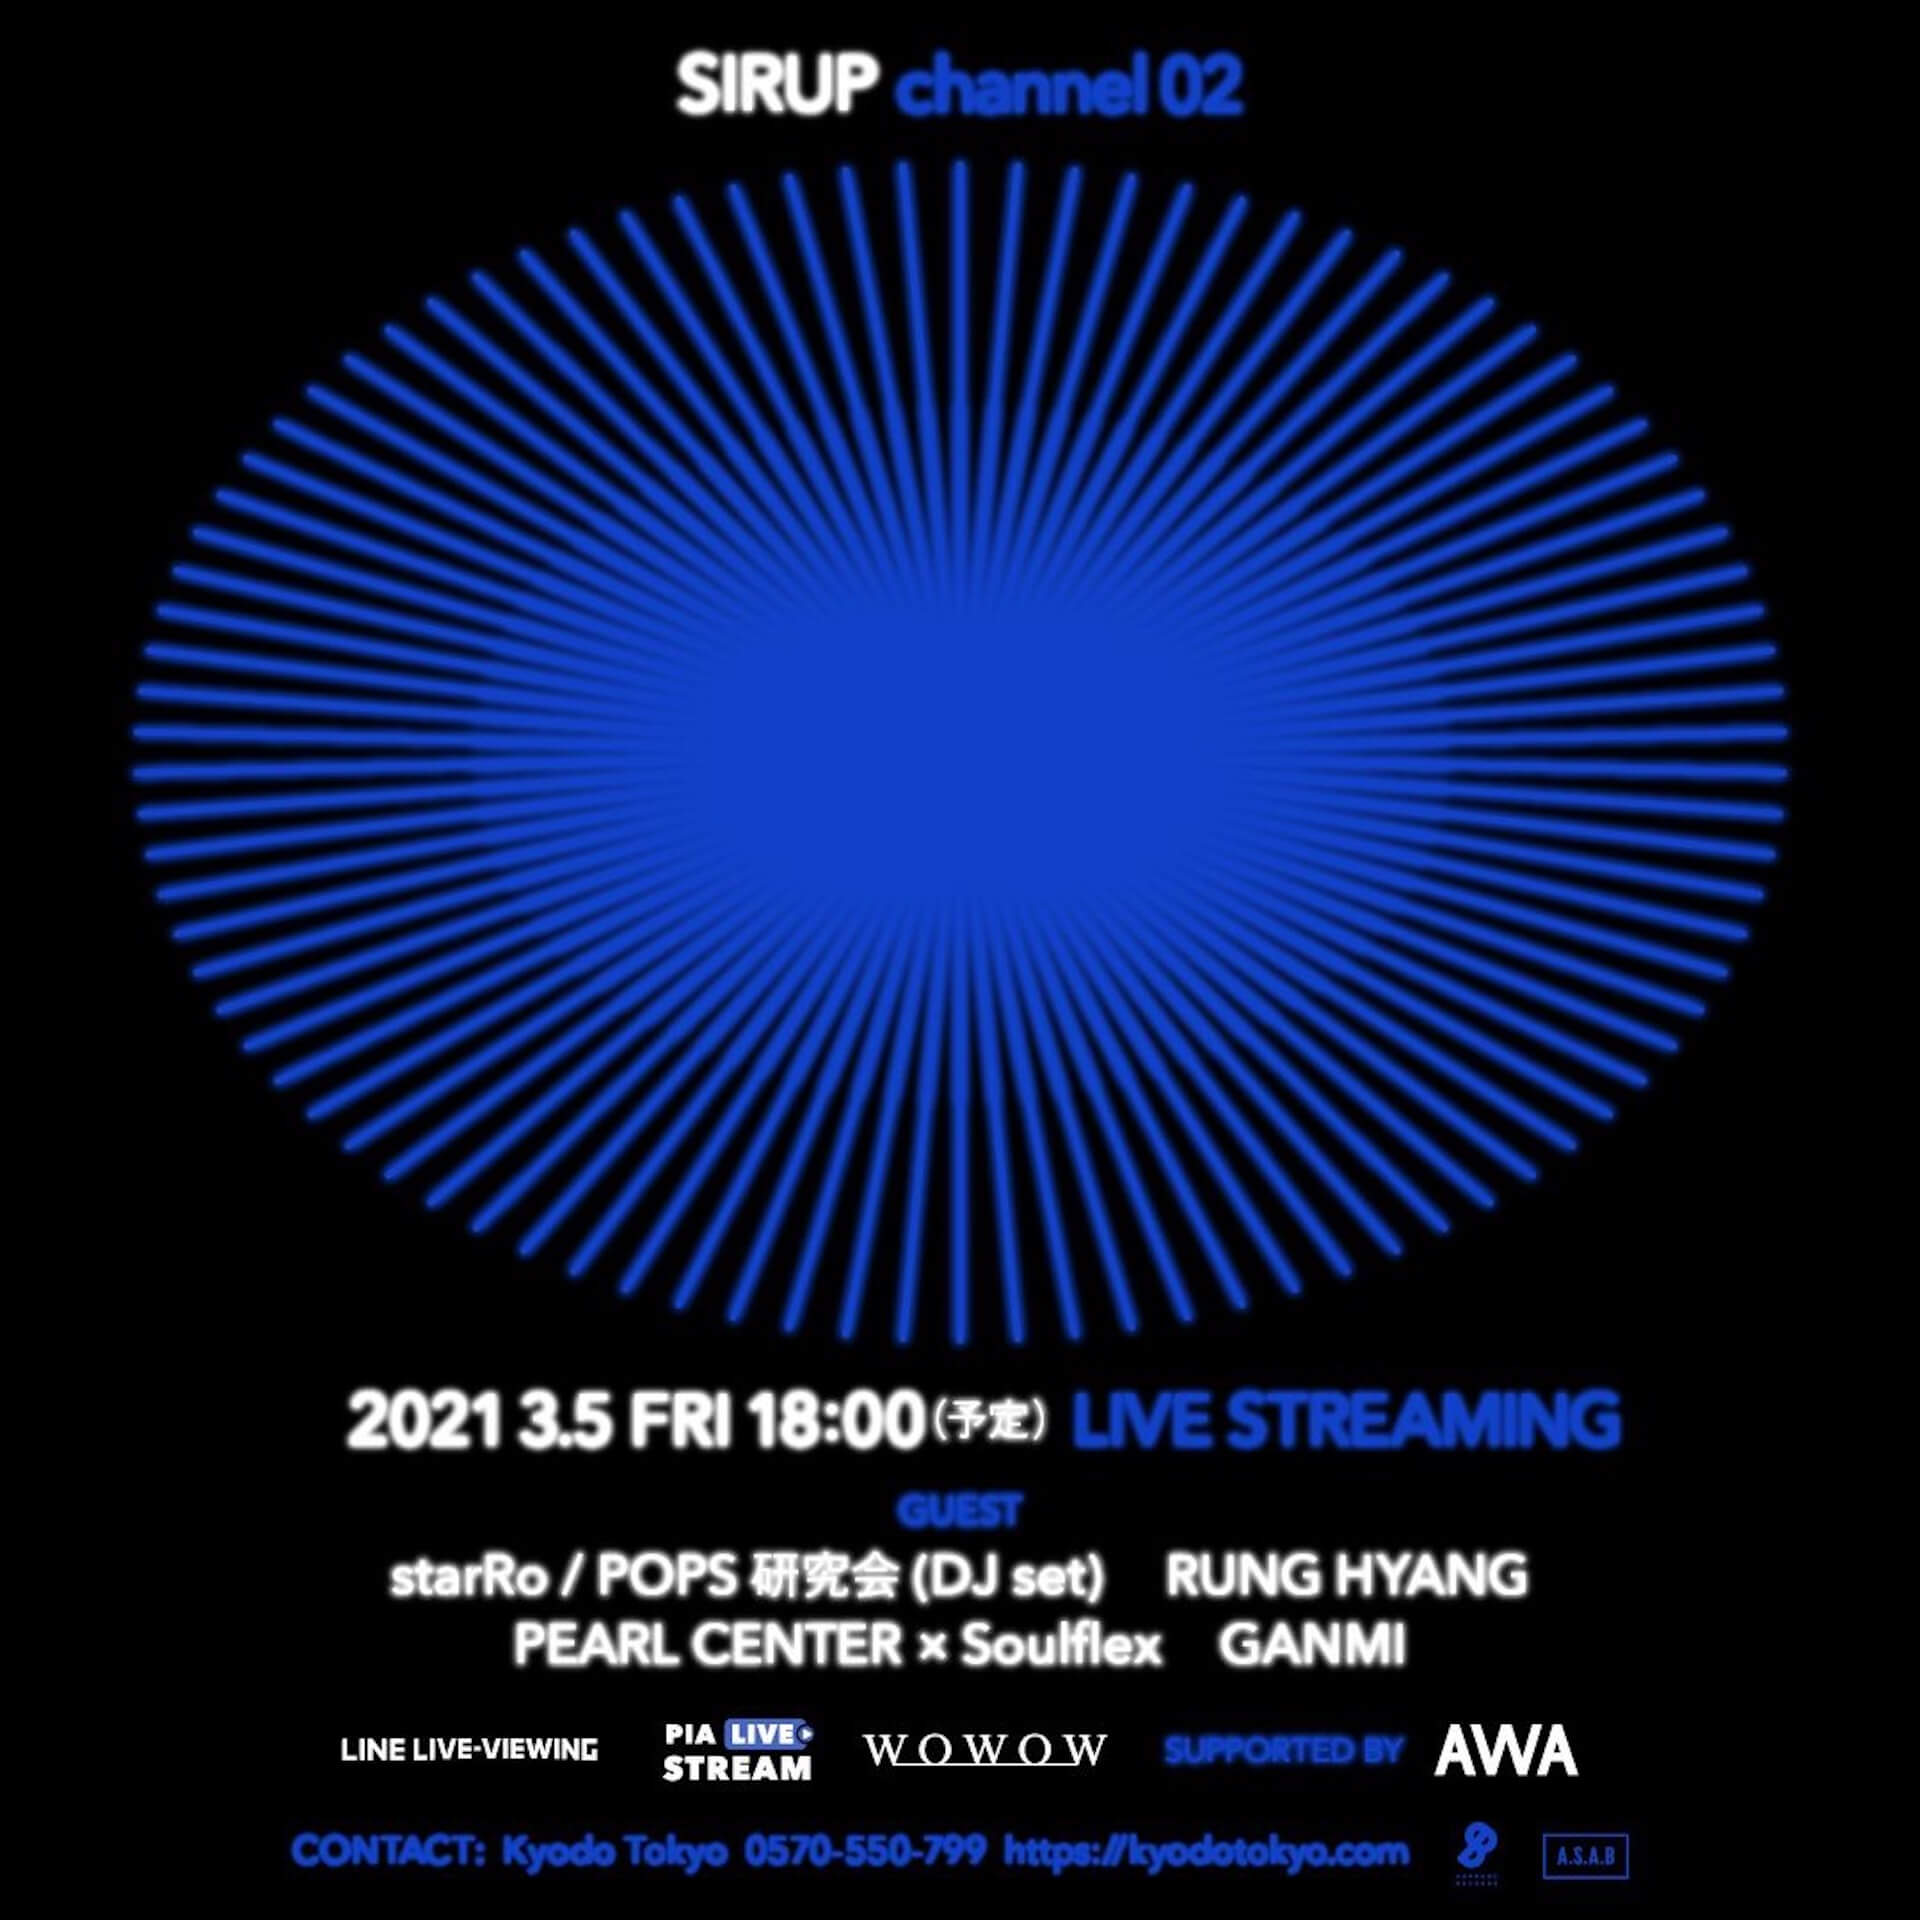 SIRUP<channel 02>が明日開催!ニューアルバム『cure』の特設サイトもオープン music210304_sirup_1